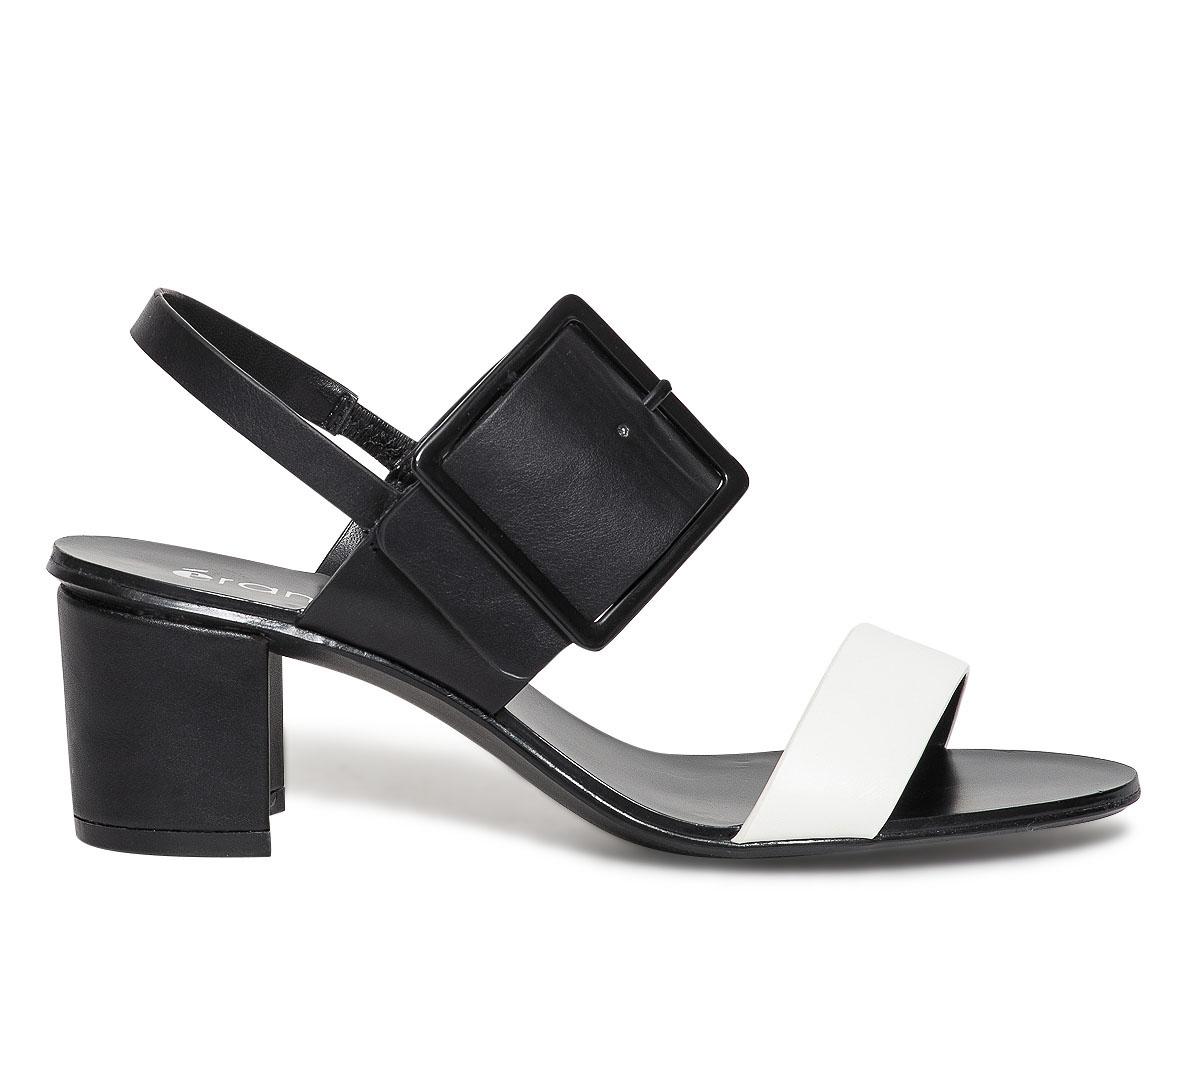 Avec Noire Boucle Sandale Large Eram QosxhCtrdB